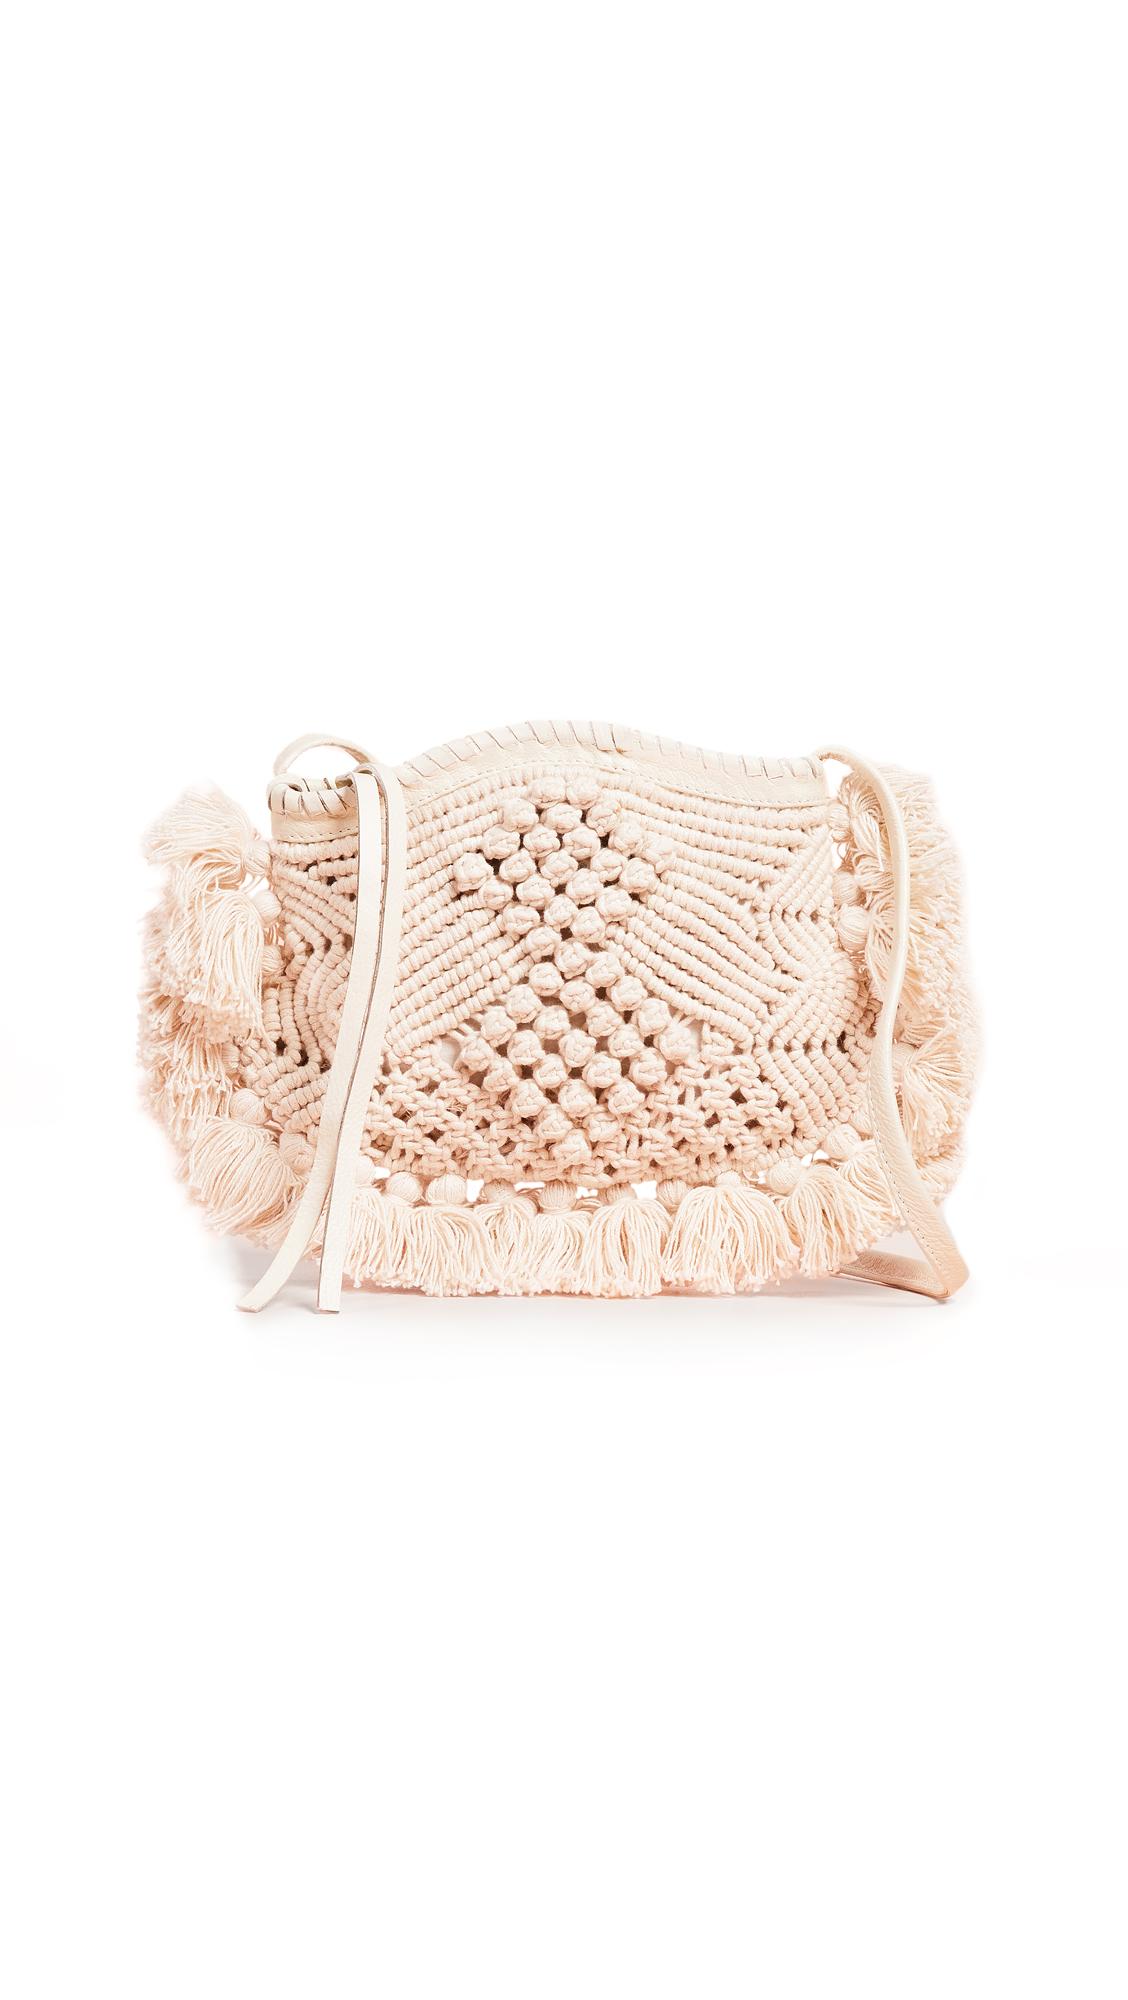 Cleobella Soho Crossbody Bag In Ivory